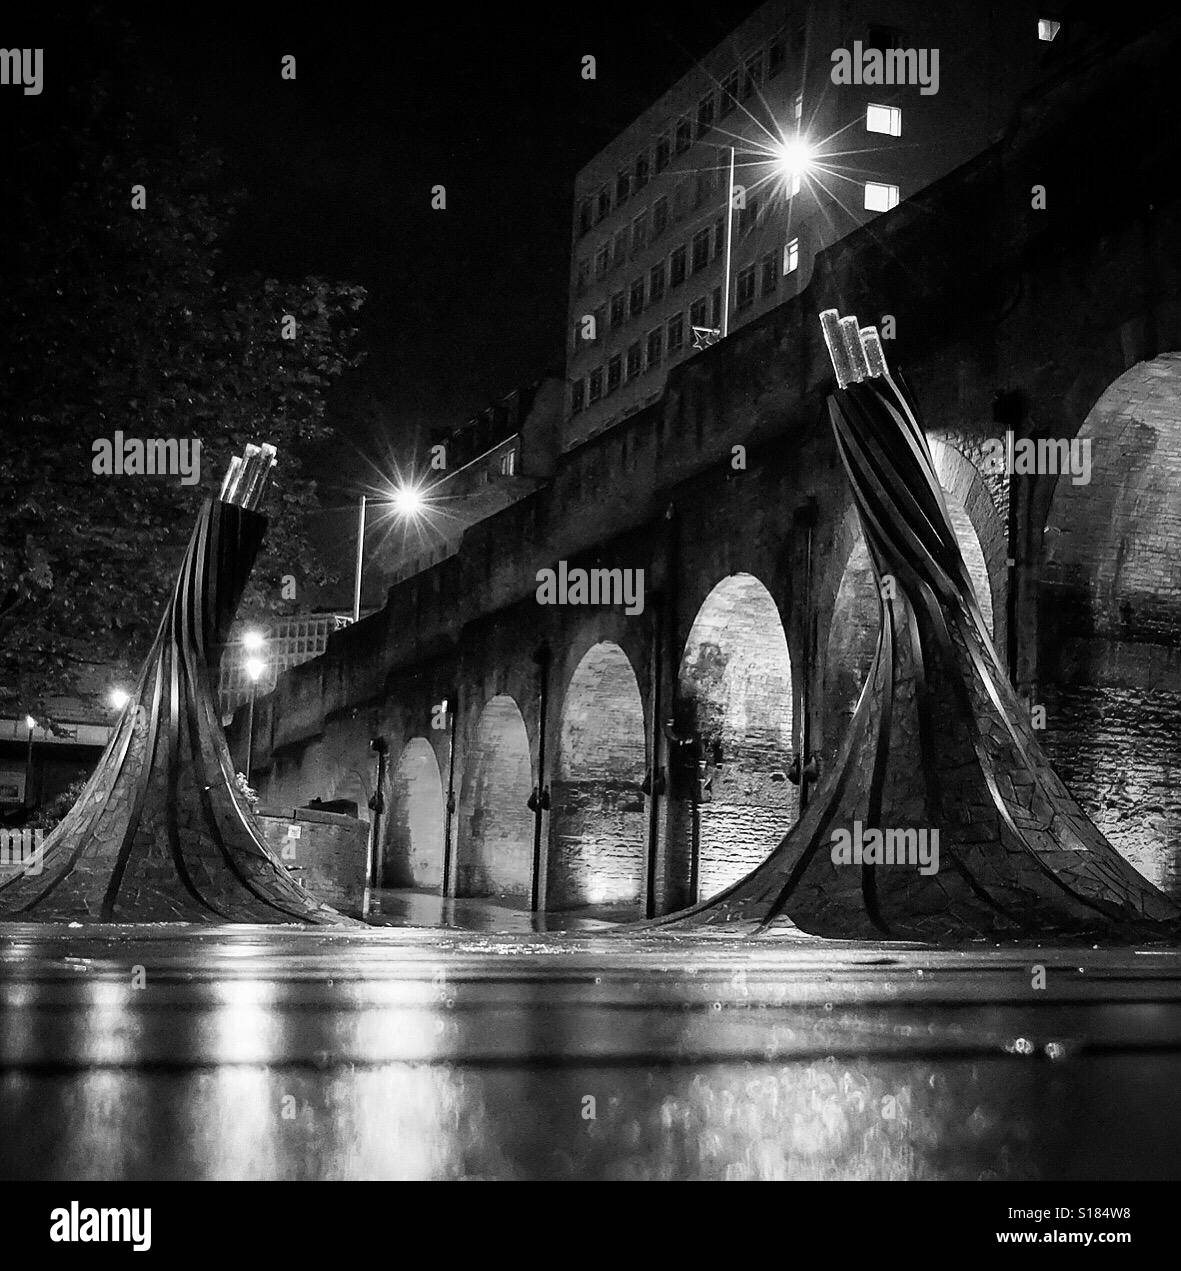 Fibres art installation in Bradford Forster Square. - Stock Image